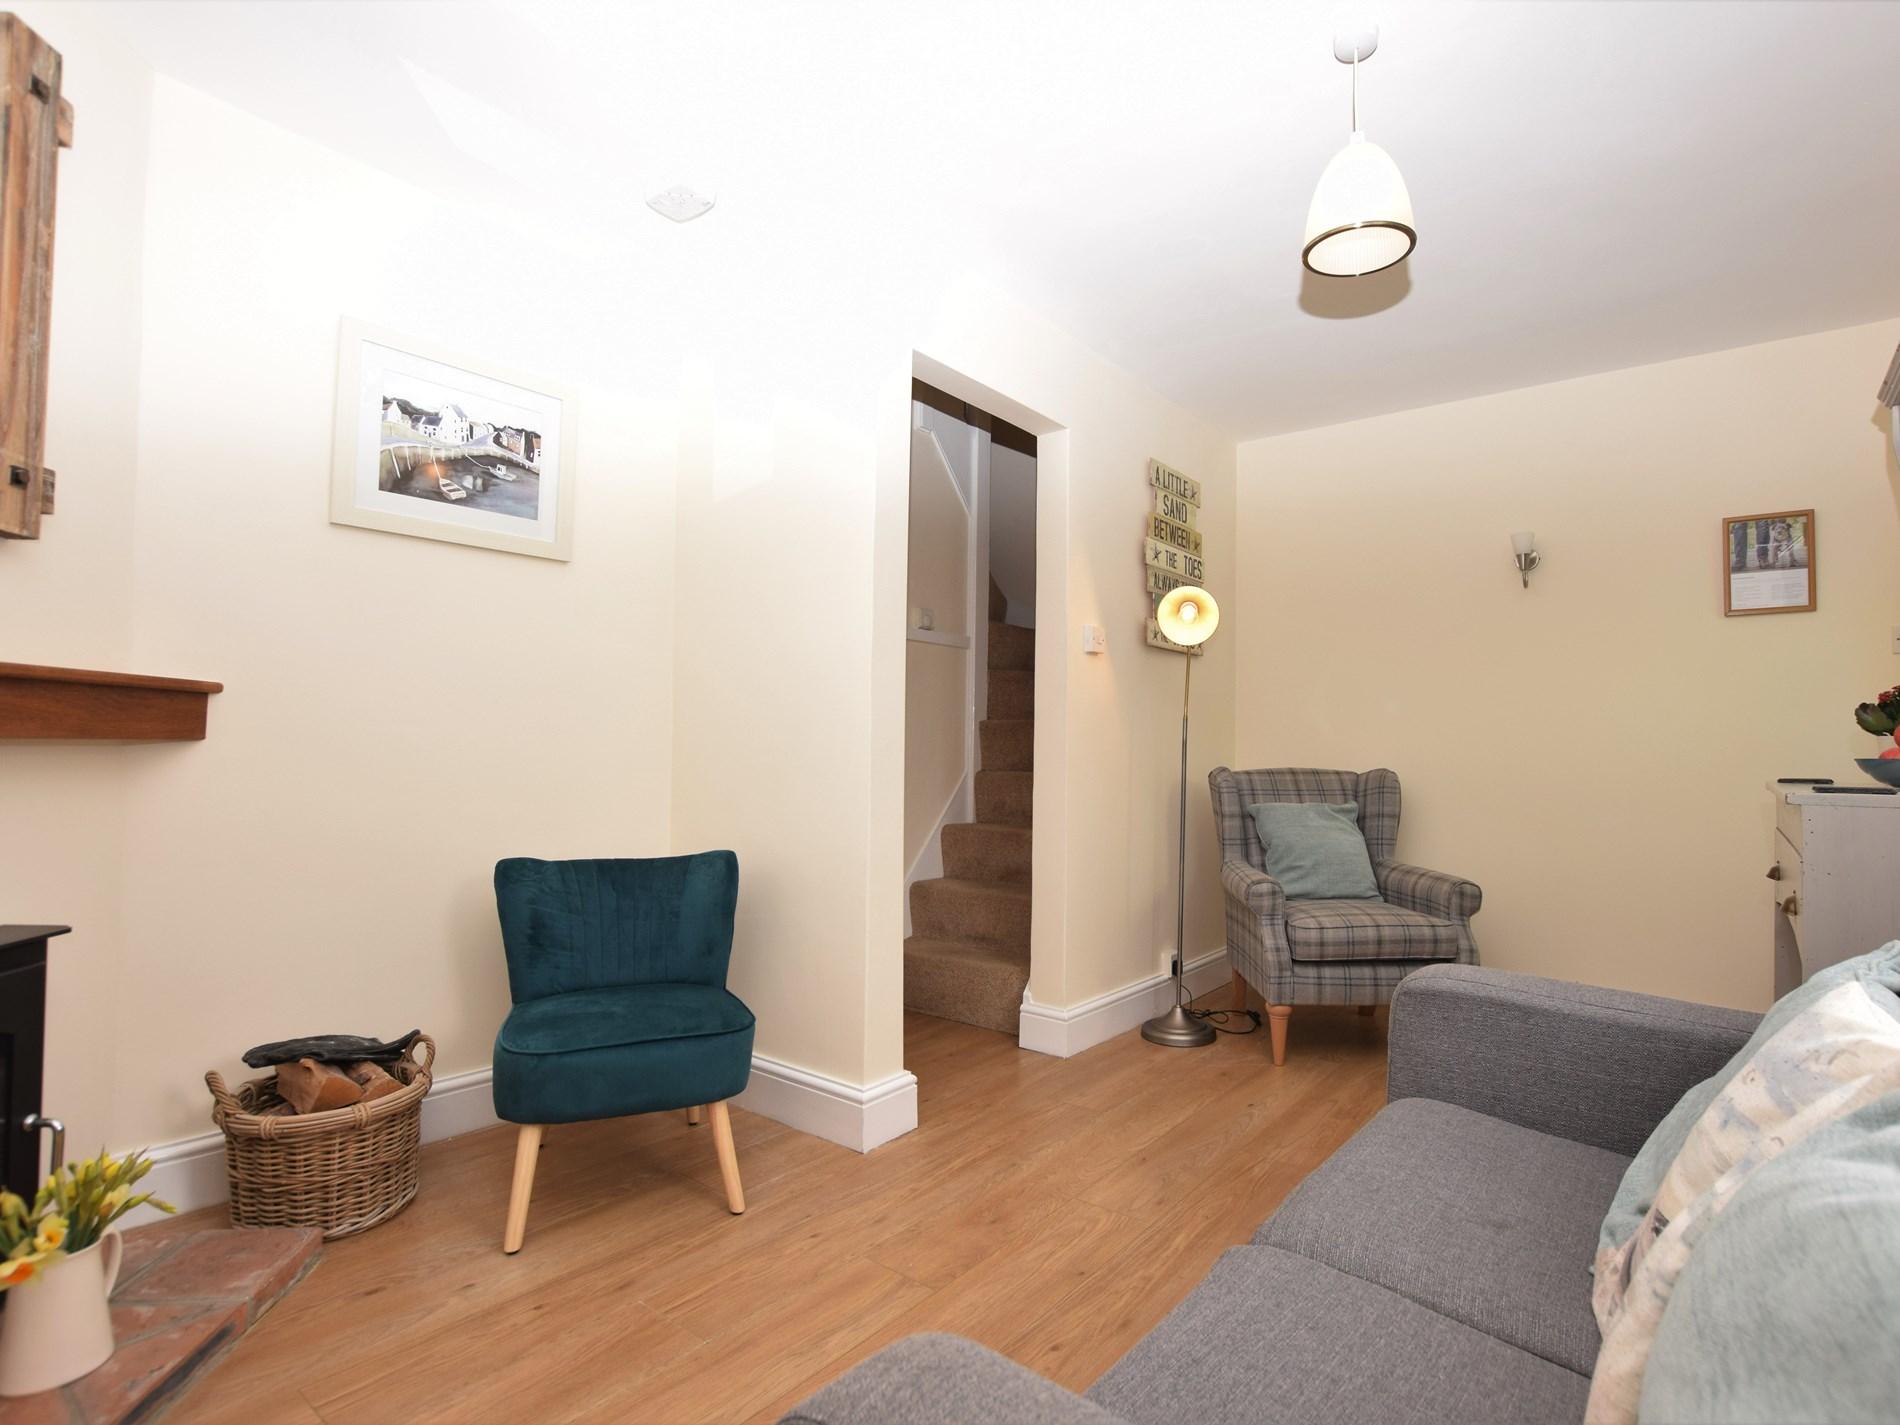 2 Bedroom Cottage in Sheringham, East Anglia